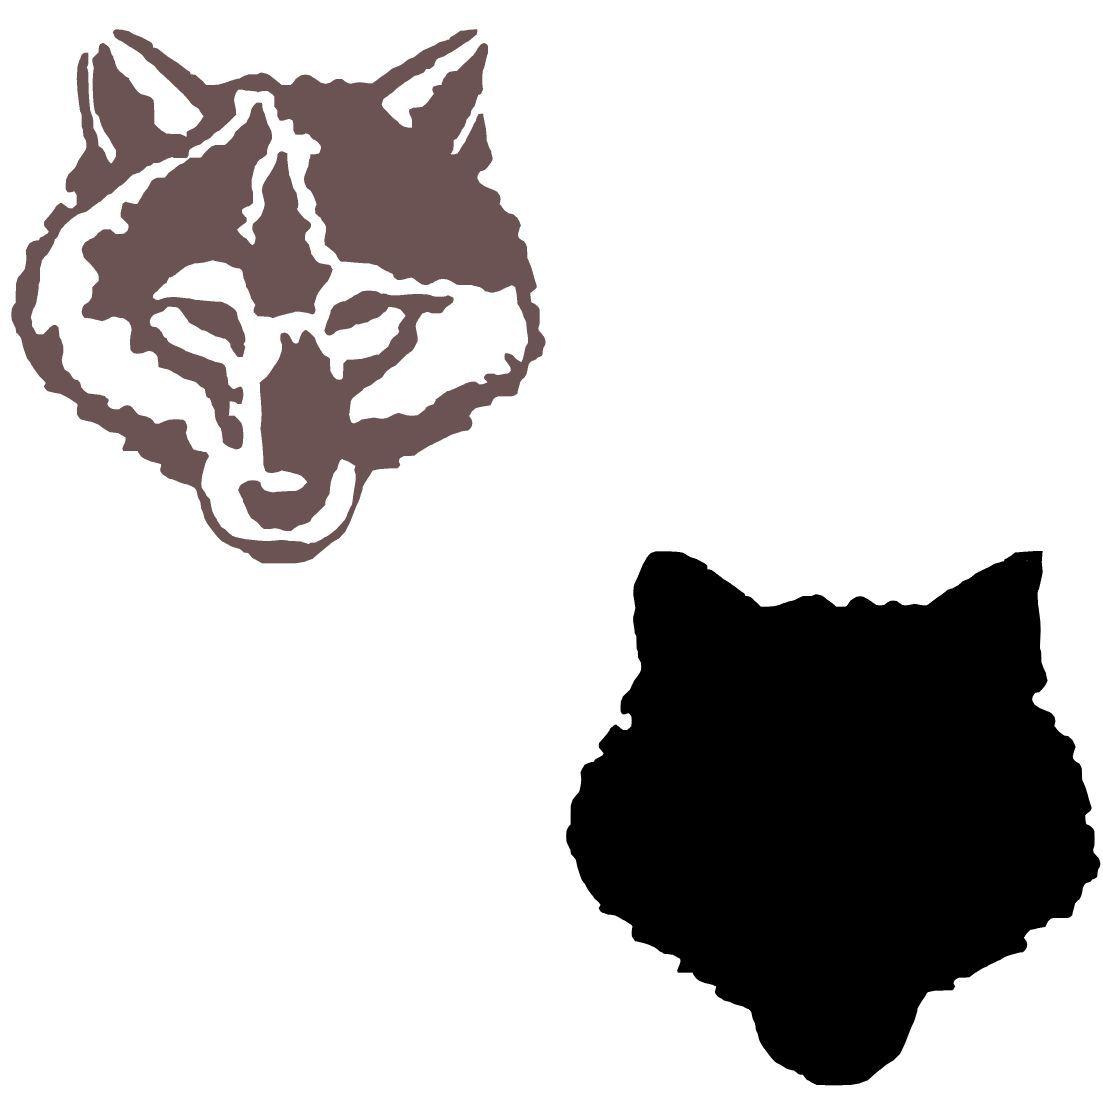 Cub Scout Wolf SVG Layer | Cub Scout/Scout Stuff | Pinterest